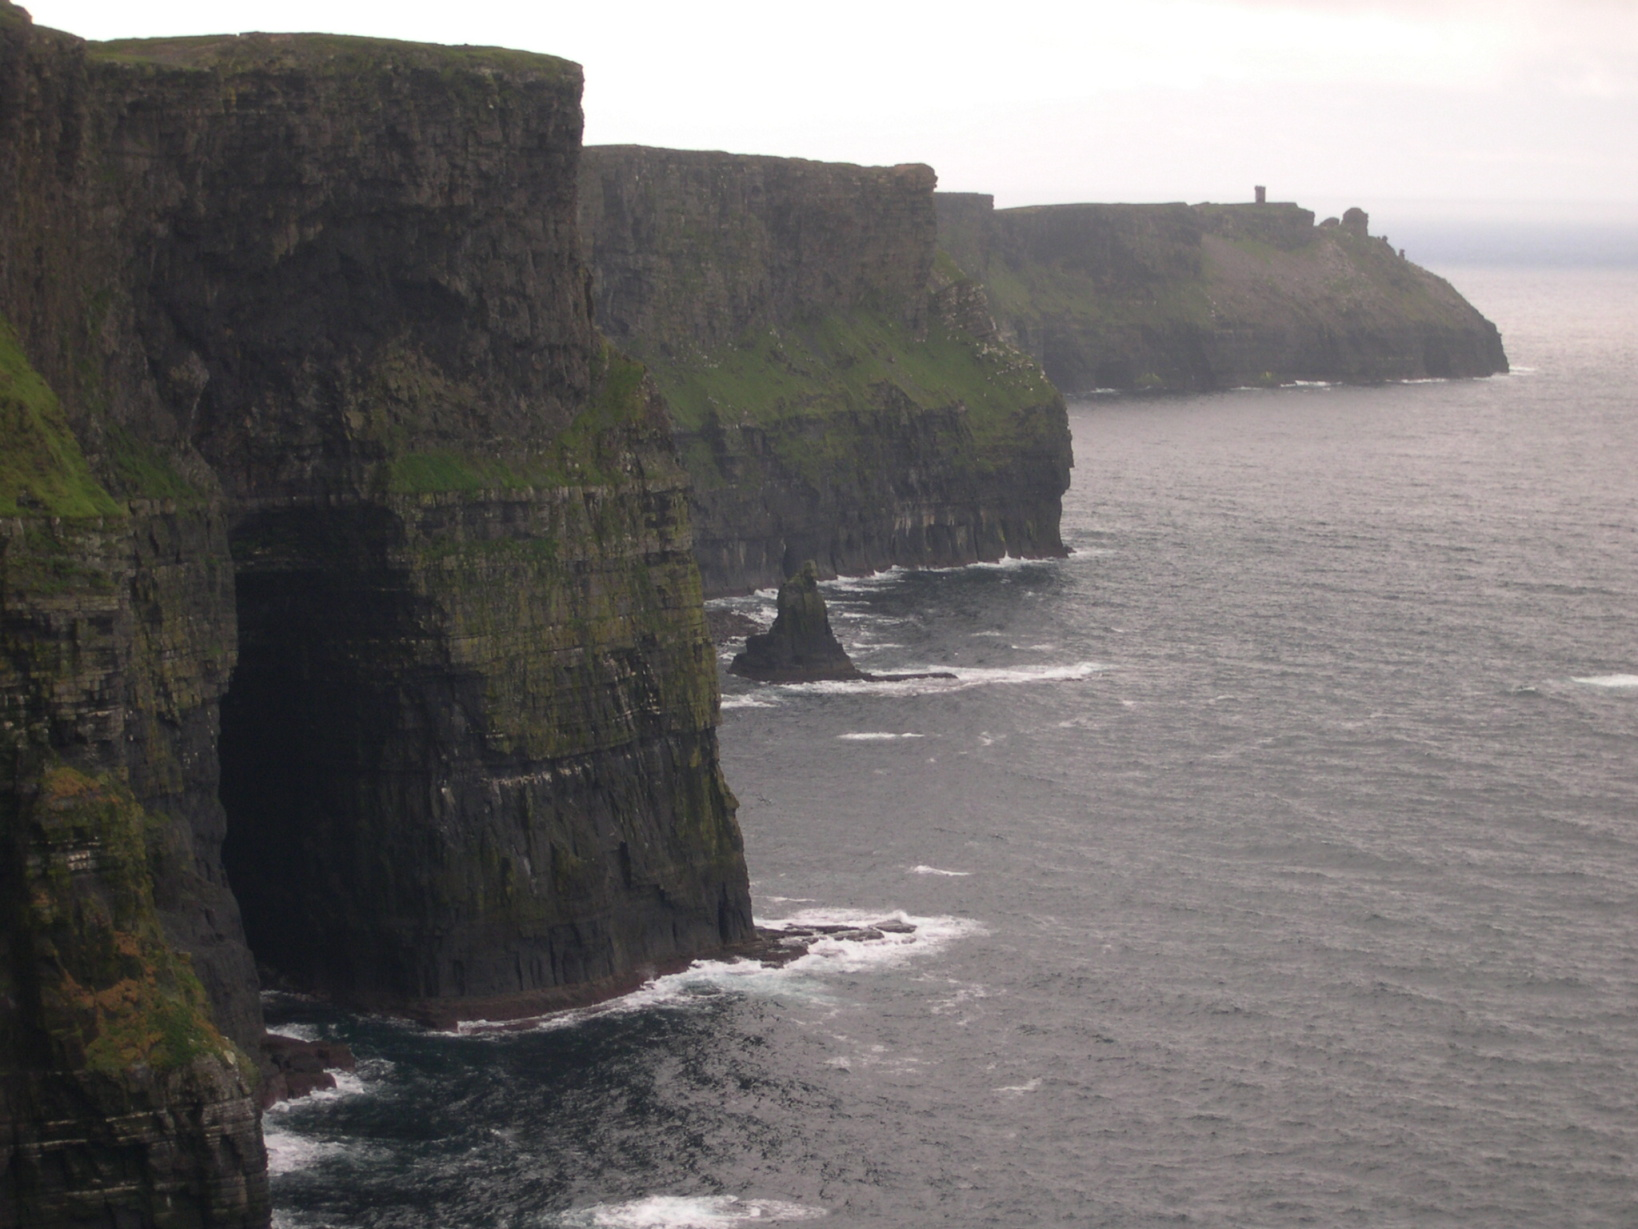 133-cliffs-of-moher-irsko.jpg